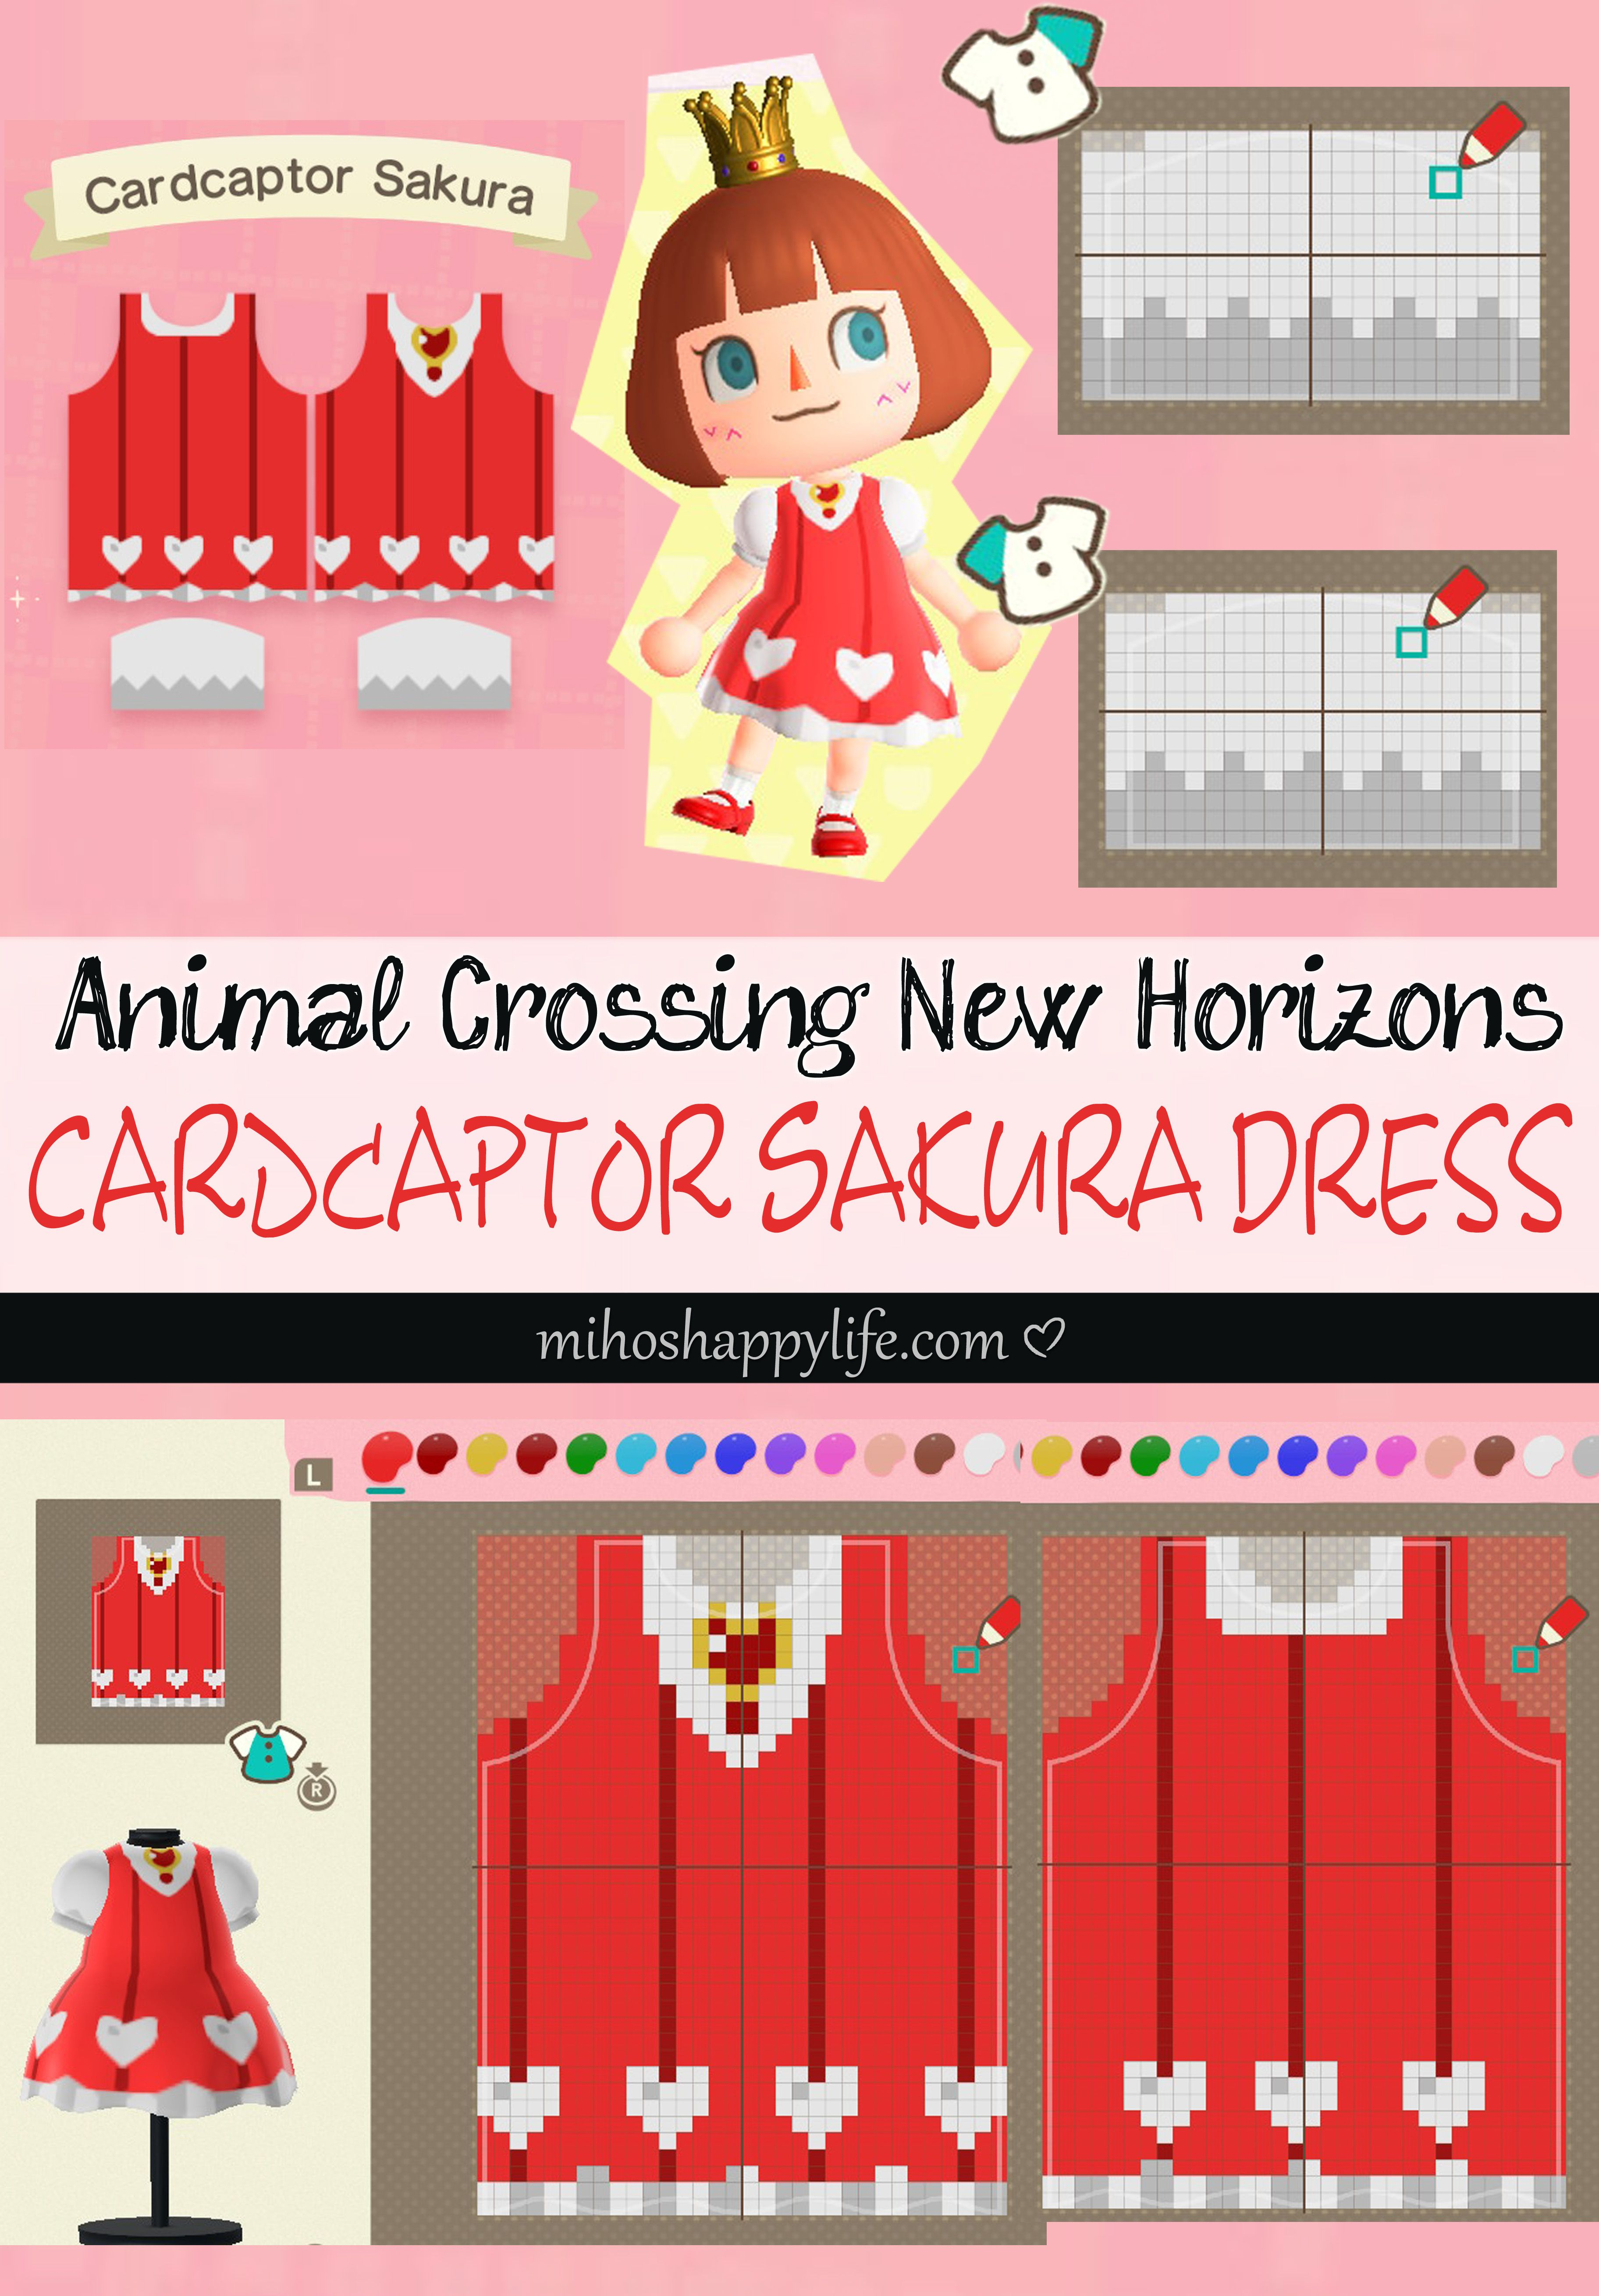 Animal crossing new horizons template design cardcaptor